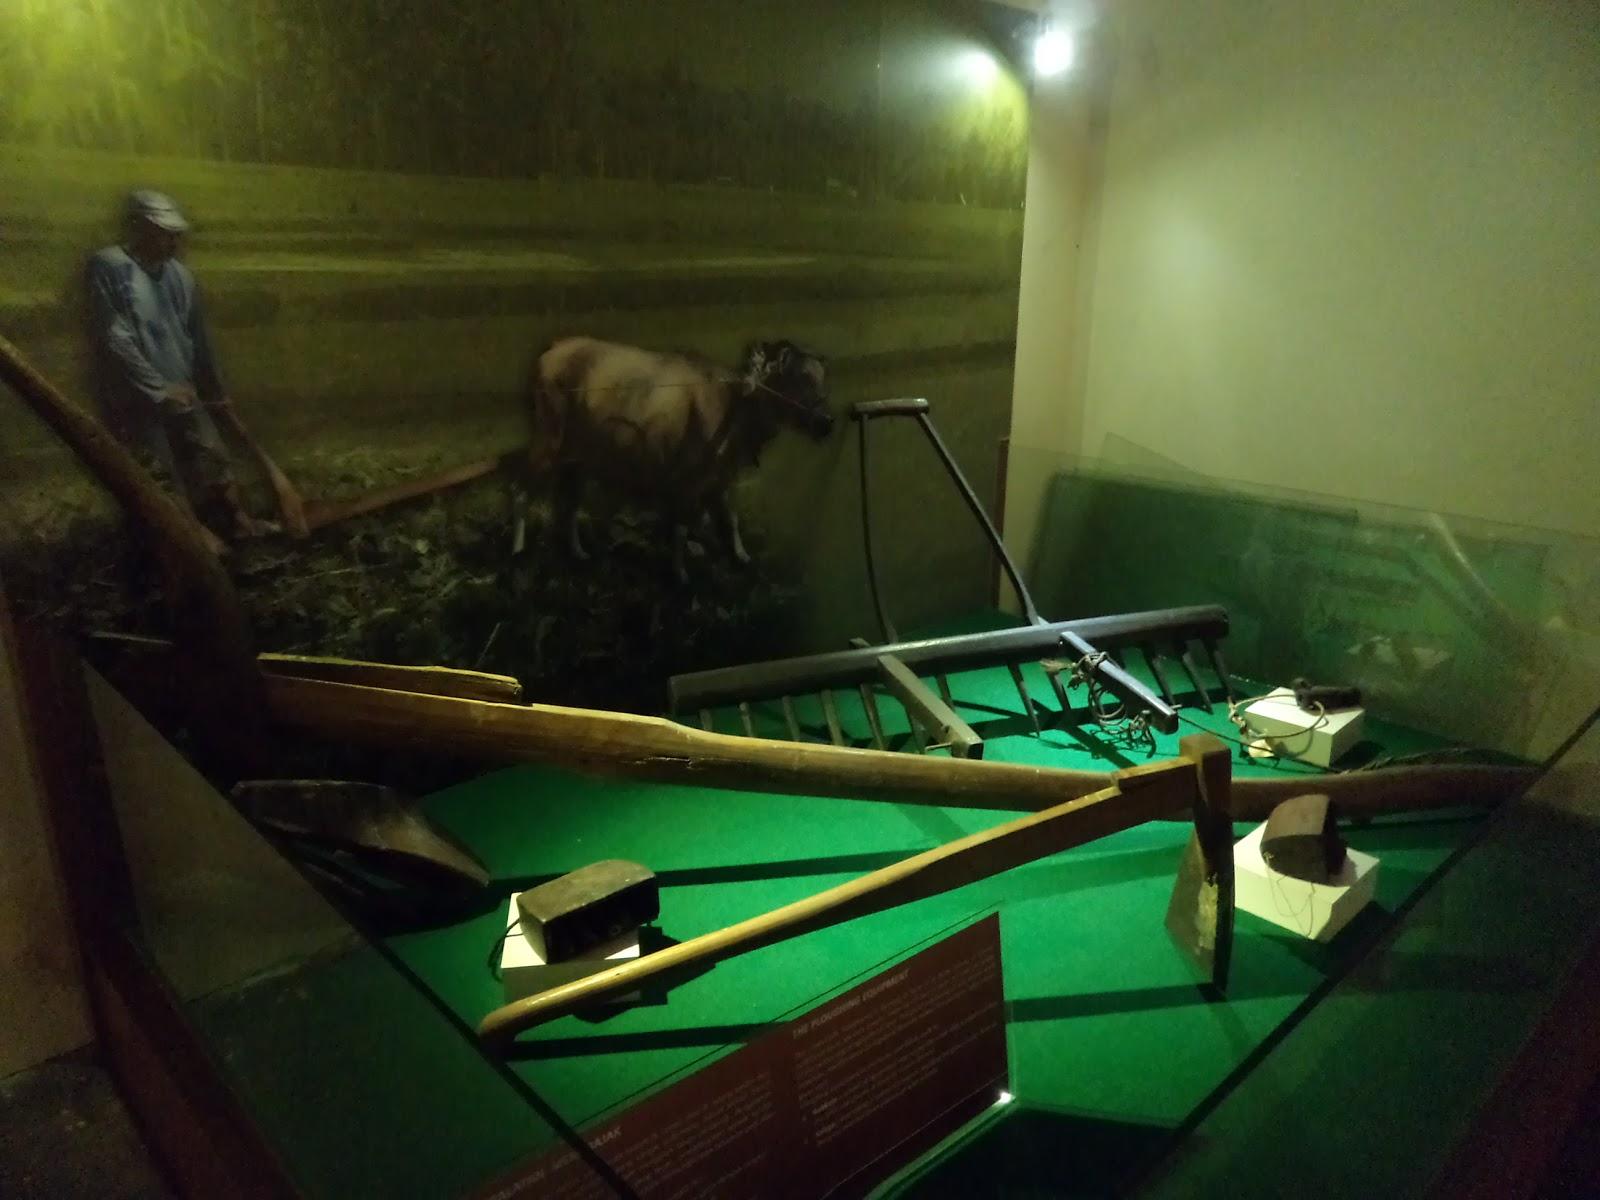 Koleksi Alat Pertanian Museum La Galigo Wisata Kerja Indonesia Bajak